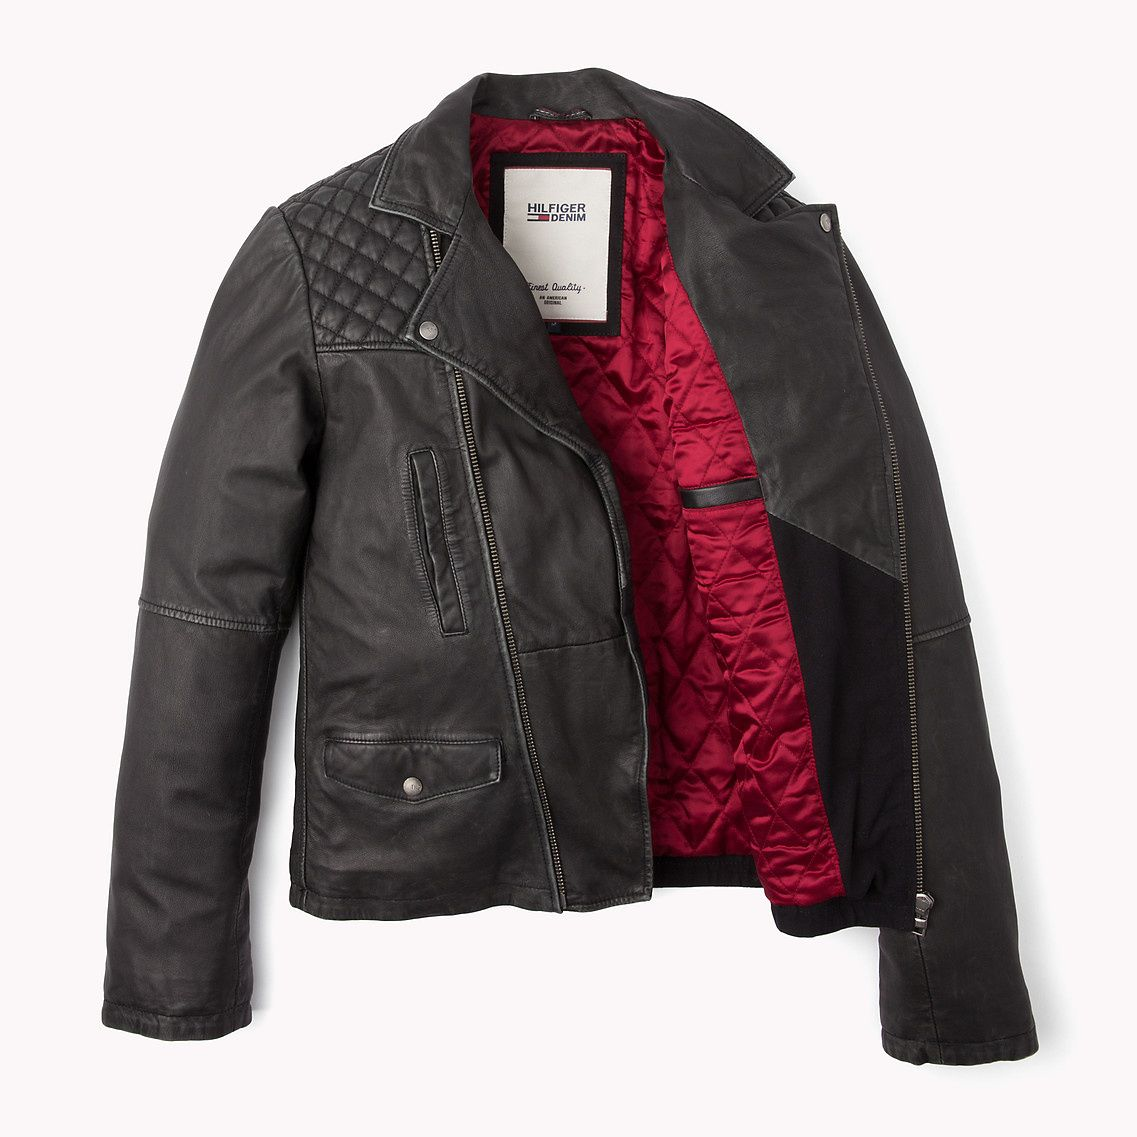 Josh Leather Jacket Tommy Hilfiger Leather jacket